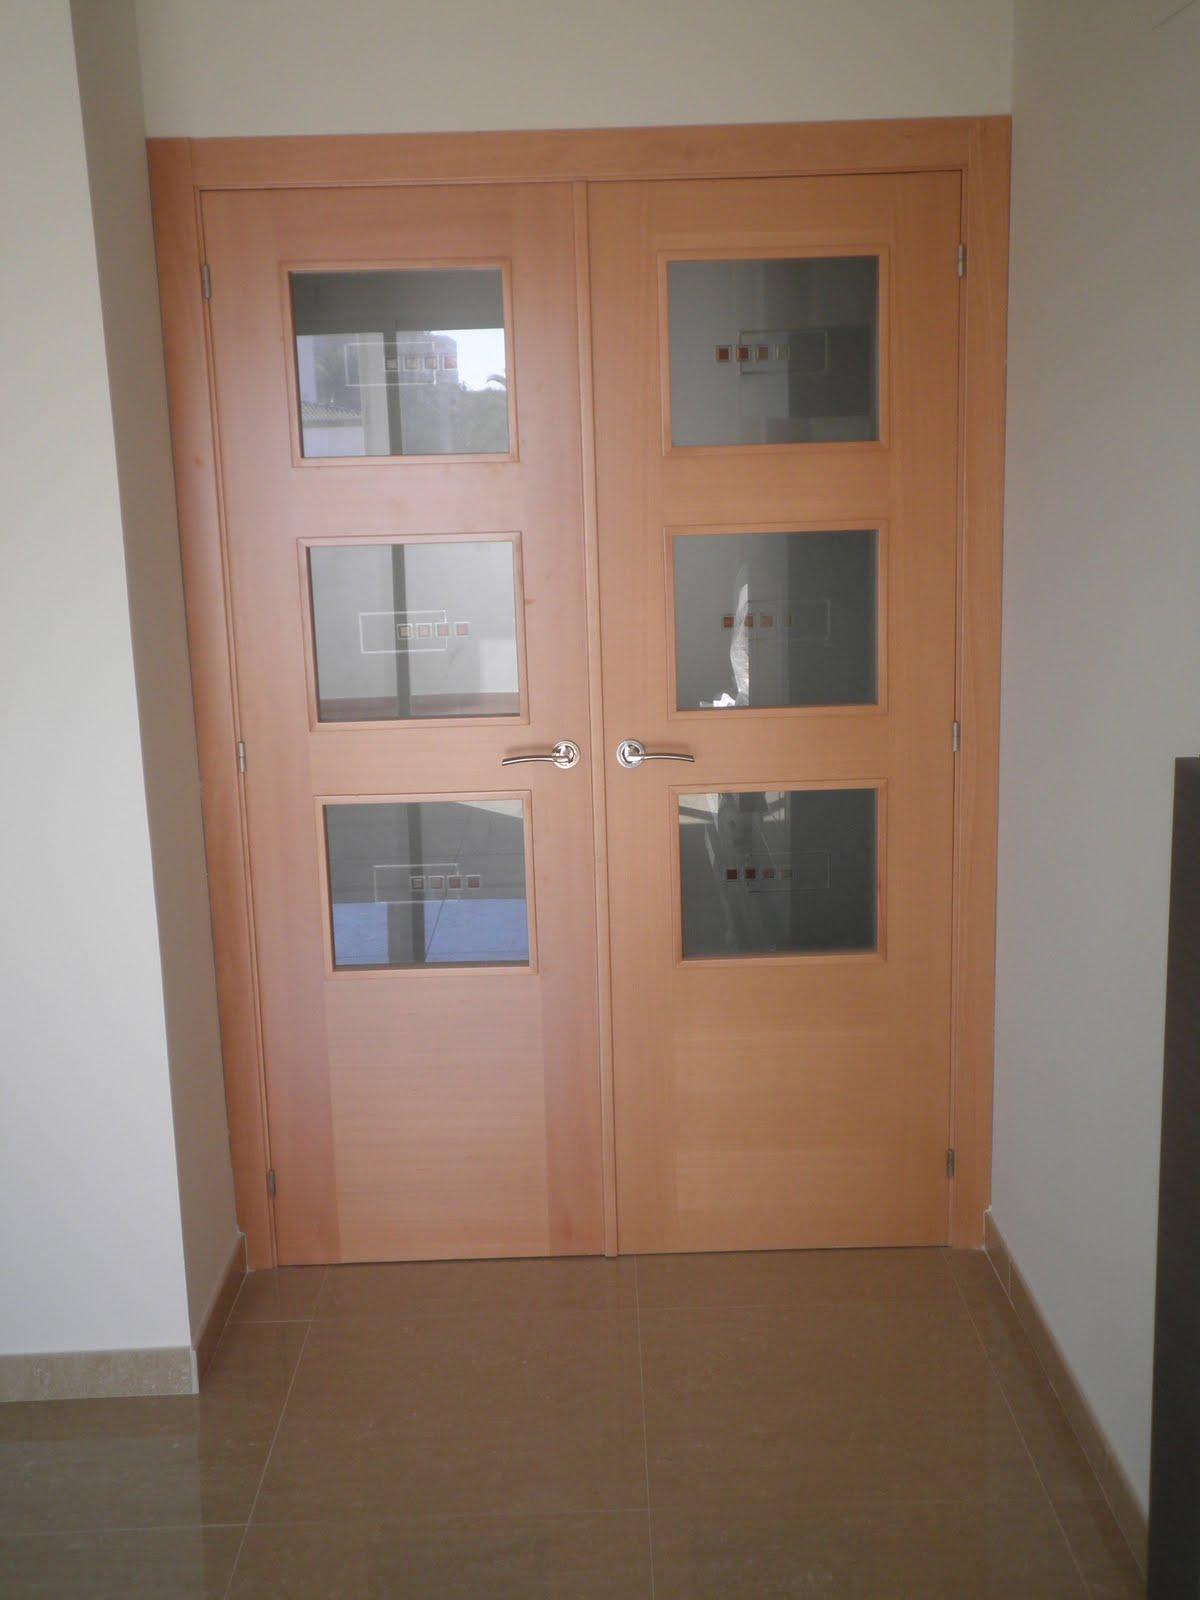 Decoraciones sahuquillo puertas haya mod h - Puertas haya vaporizada ...